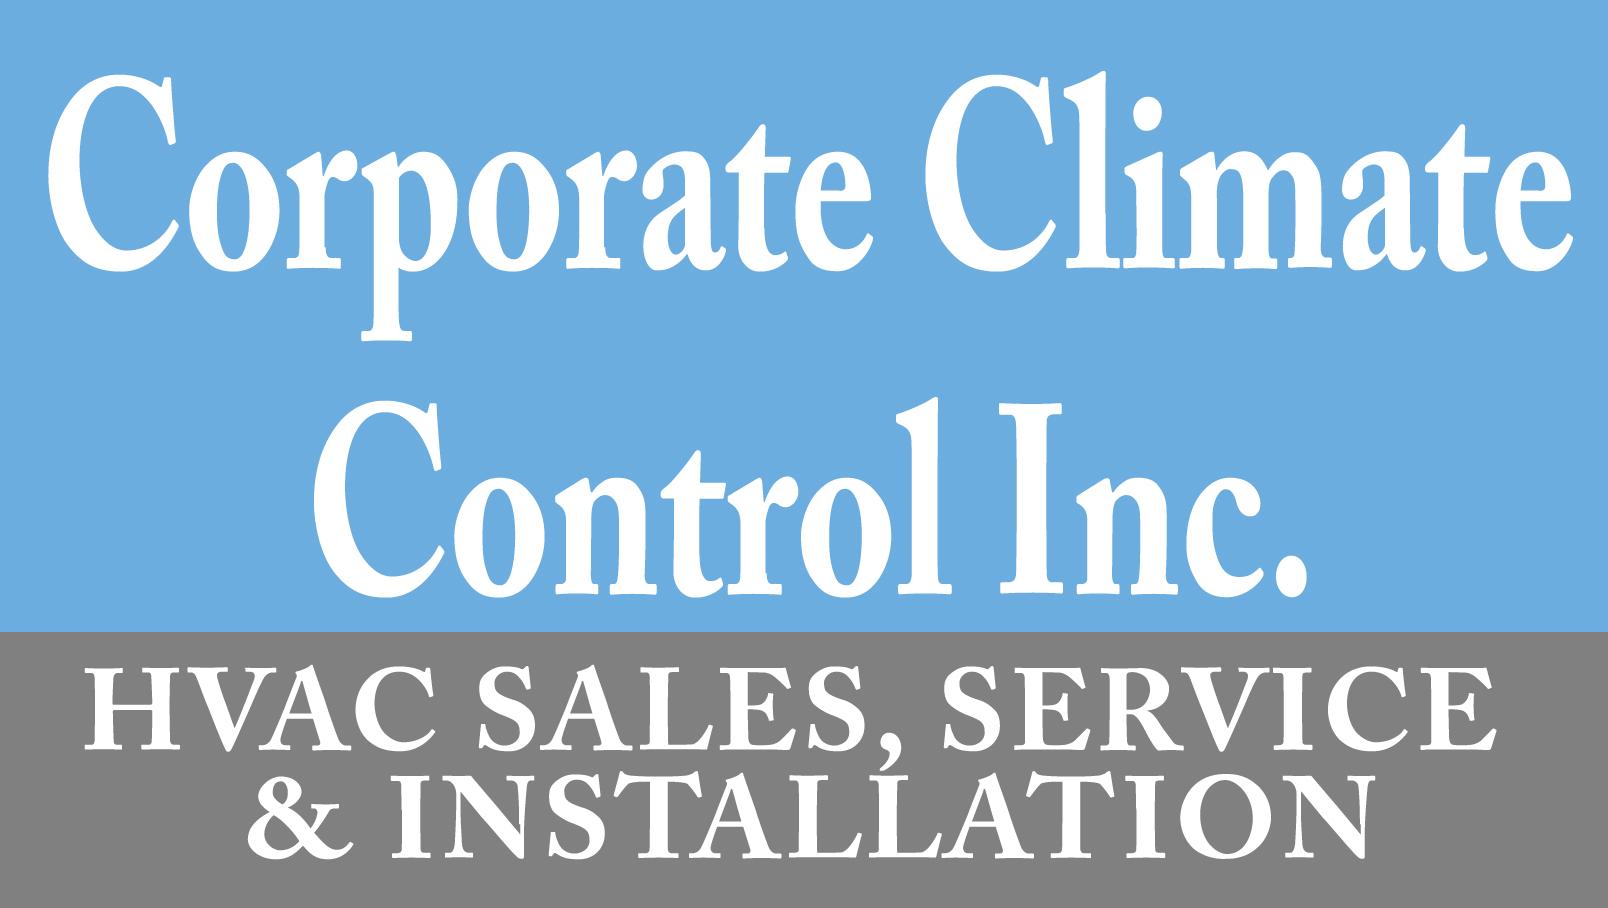 CorpClimateControl-logo.jpg